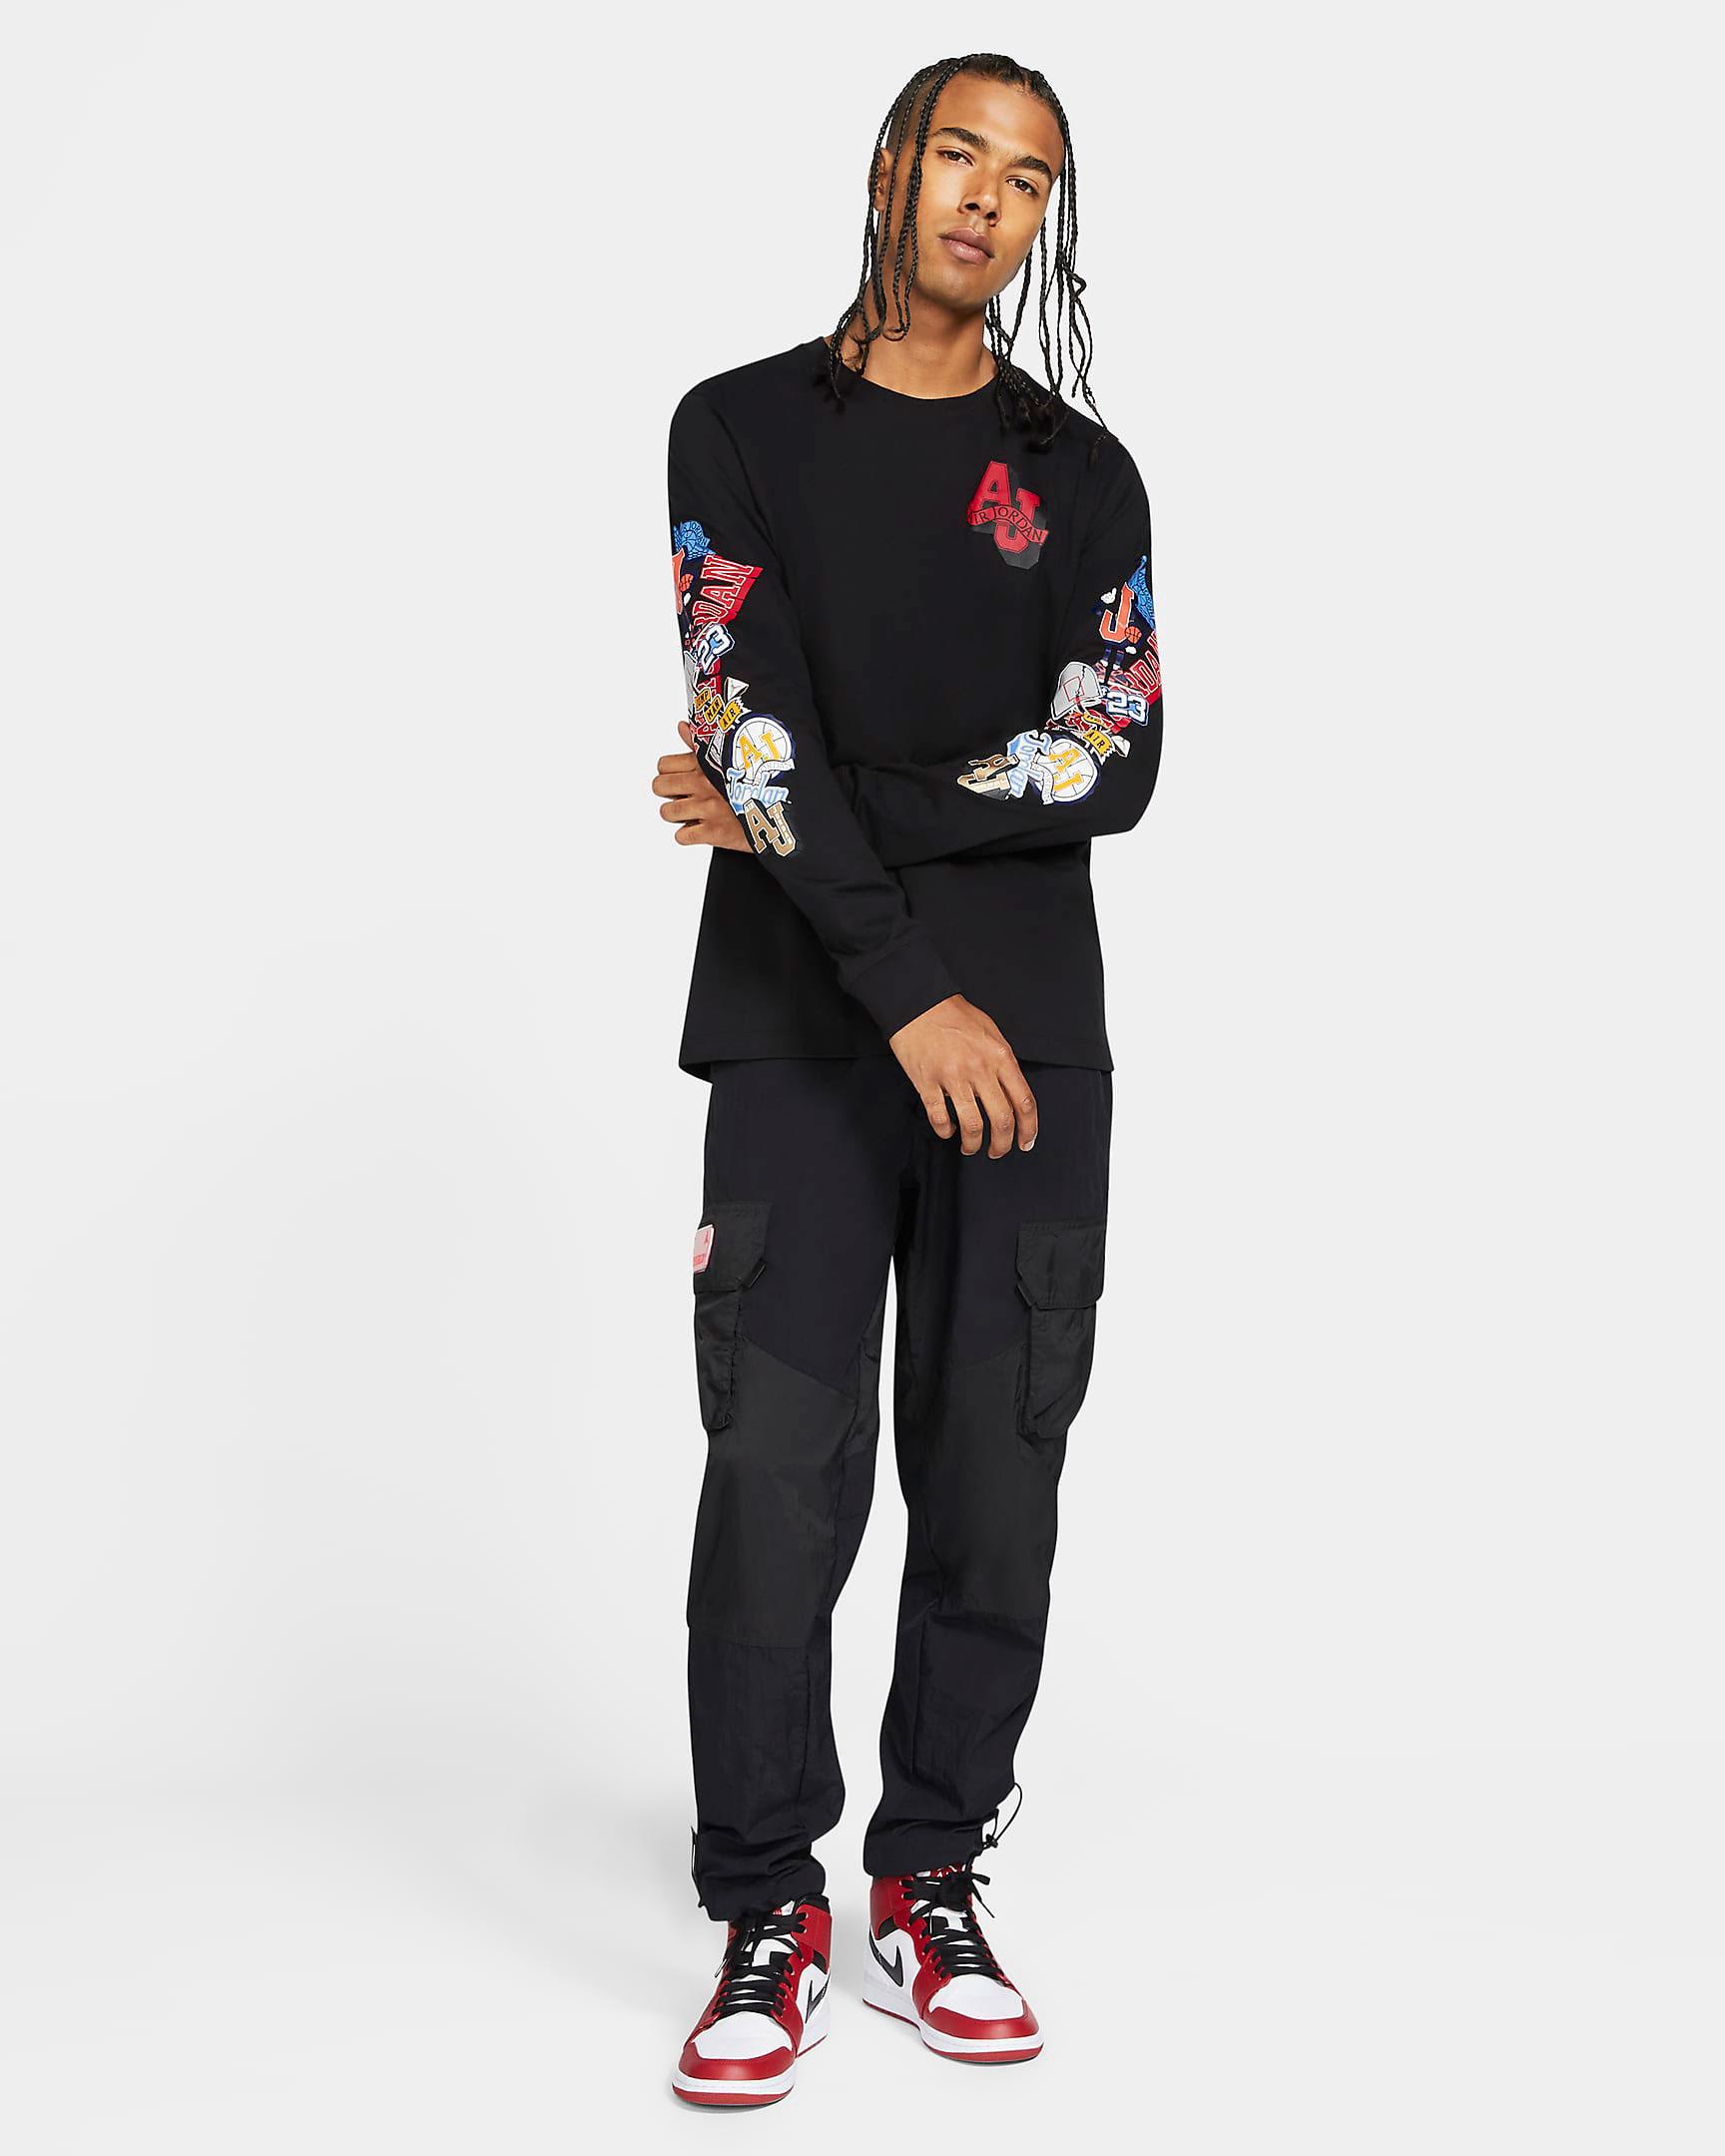 jordan-varsity-long-sleeve-shirt-black-6